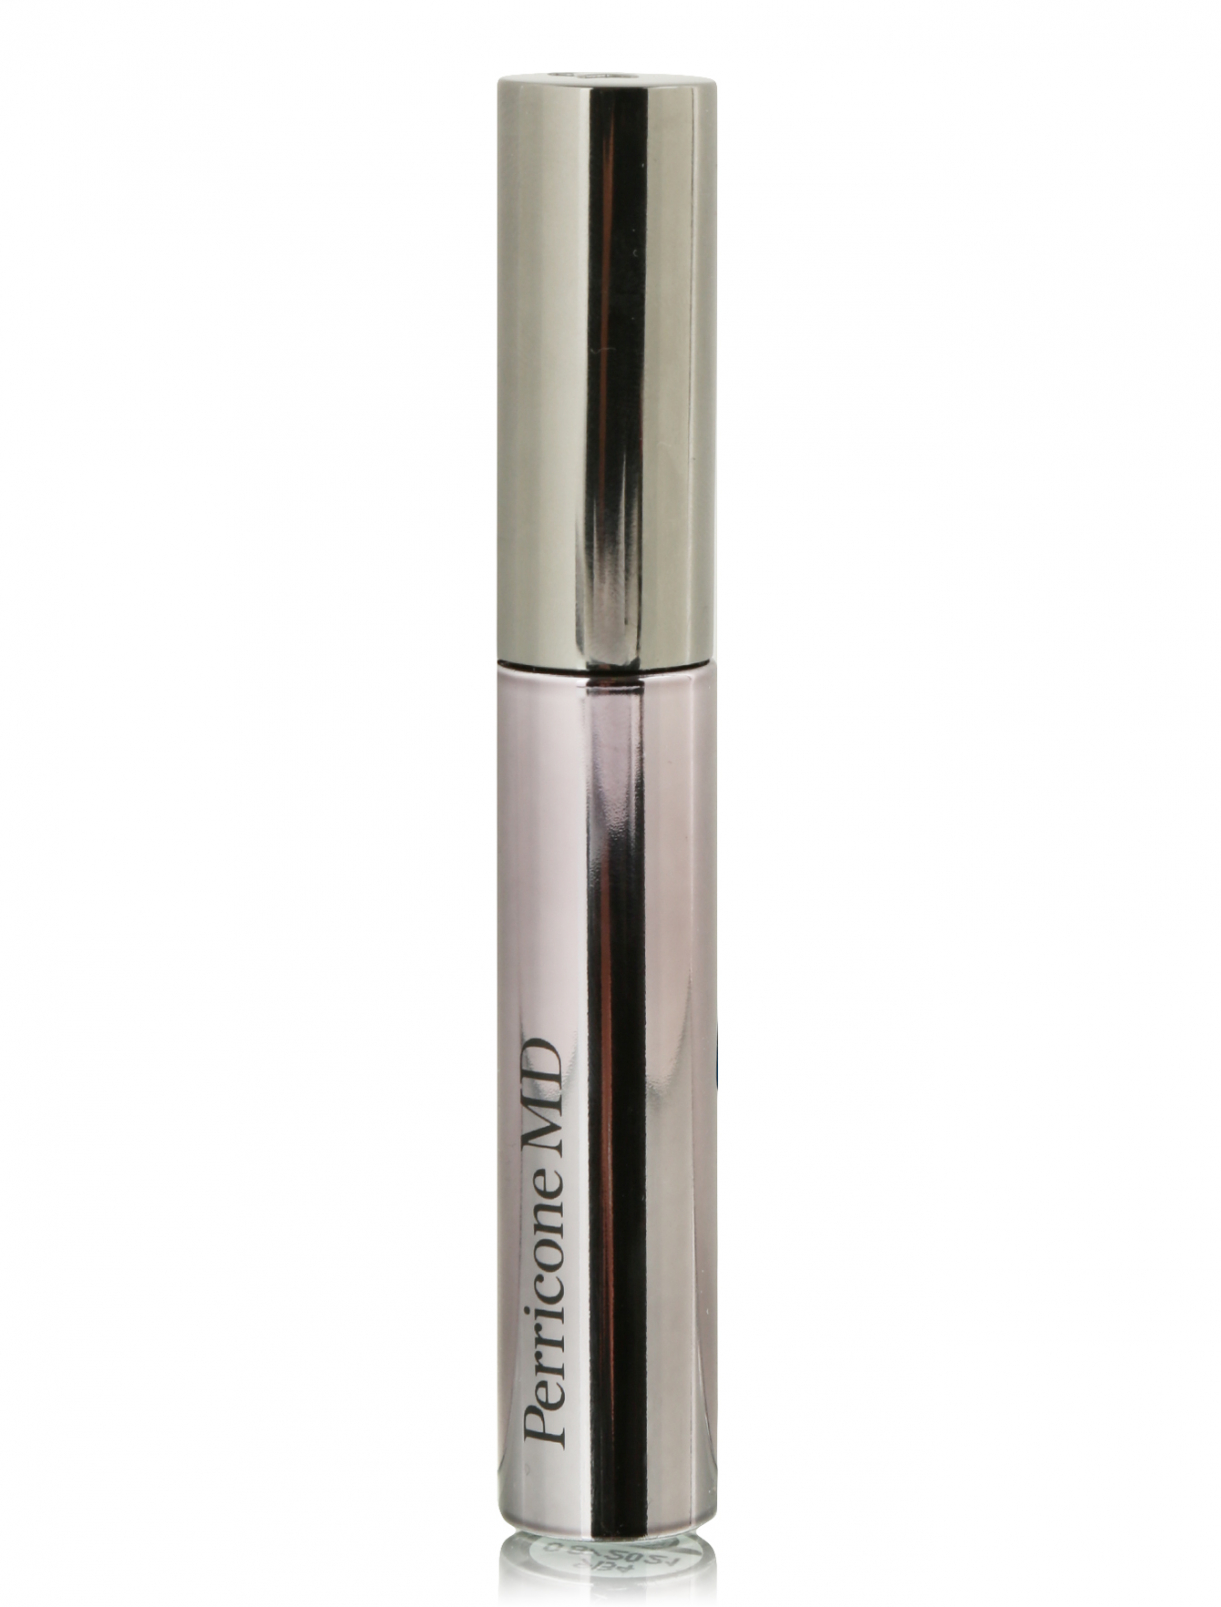 Консилер тон - tan SPF20 10 мл Makeup Perricone MD  –  Общий вид